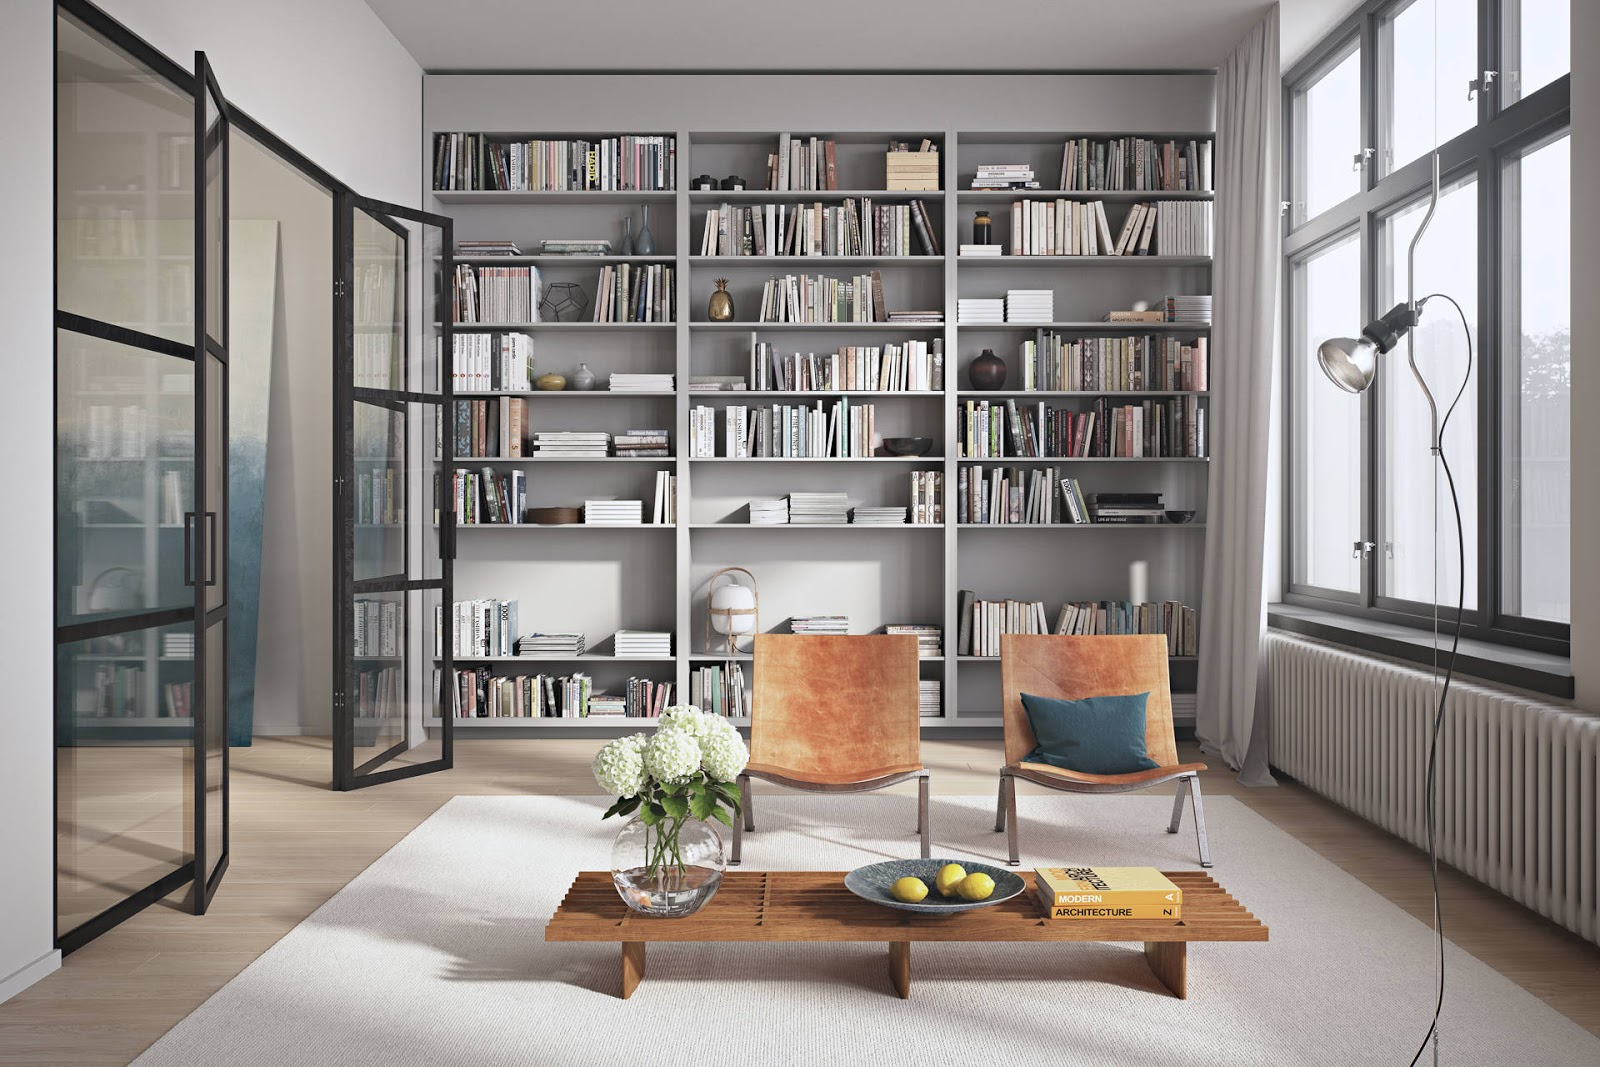 Study interior